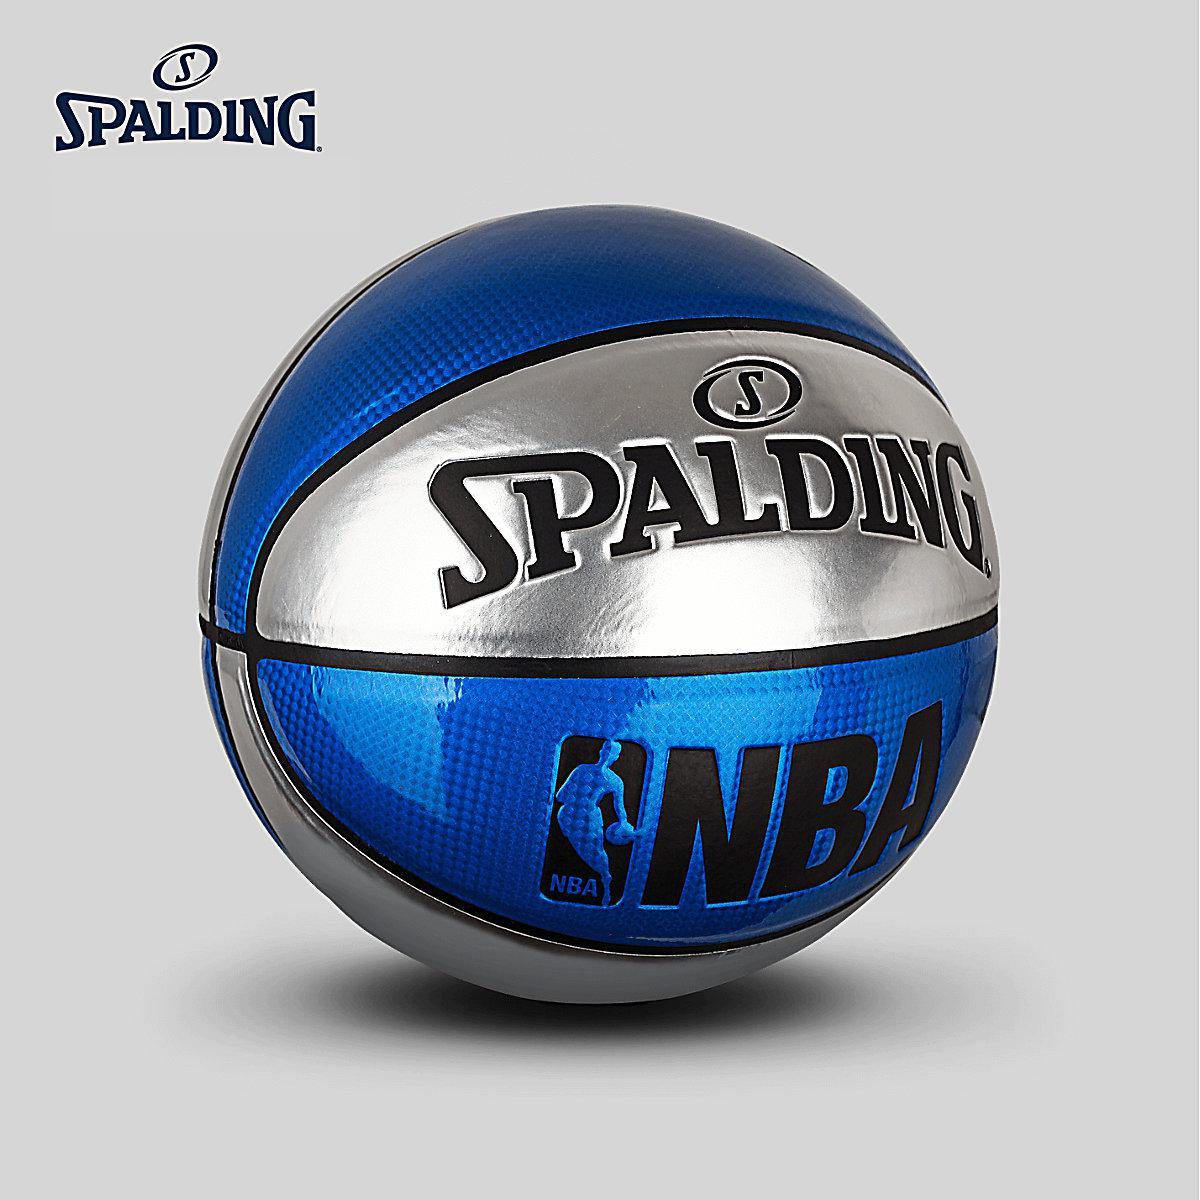 Spalding Mirror Series Men's Training Basketball Indoor Basketball Official No. 7 Pu Men's Game Ball Training Ball